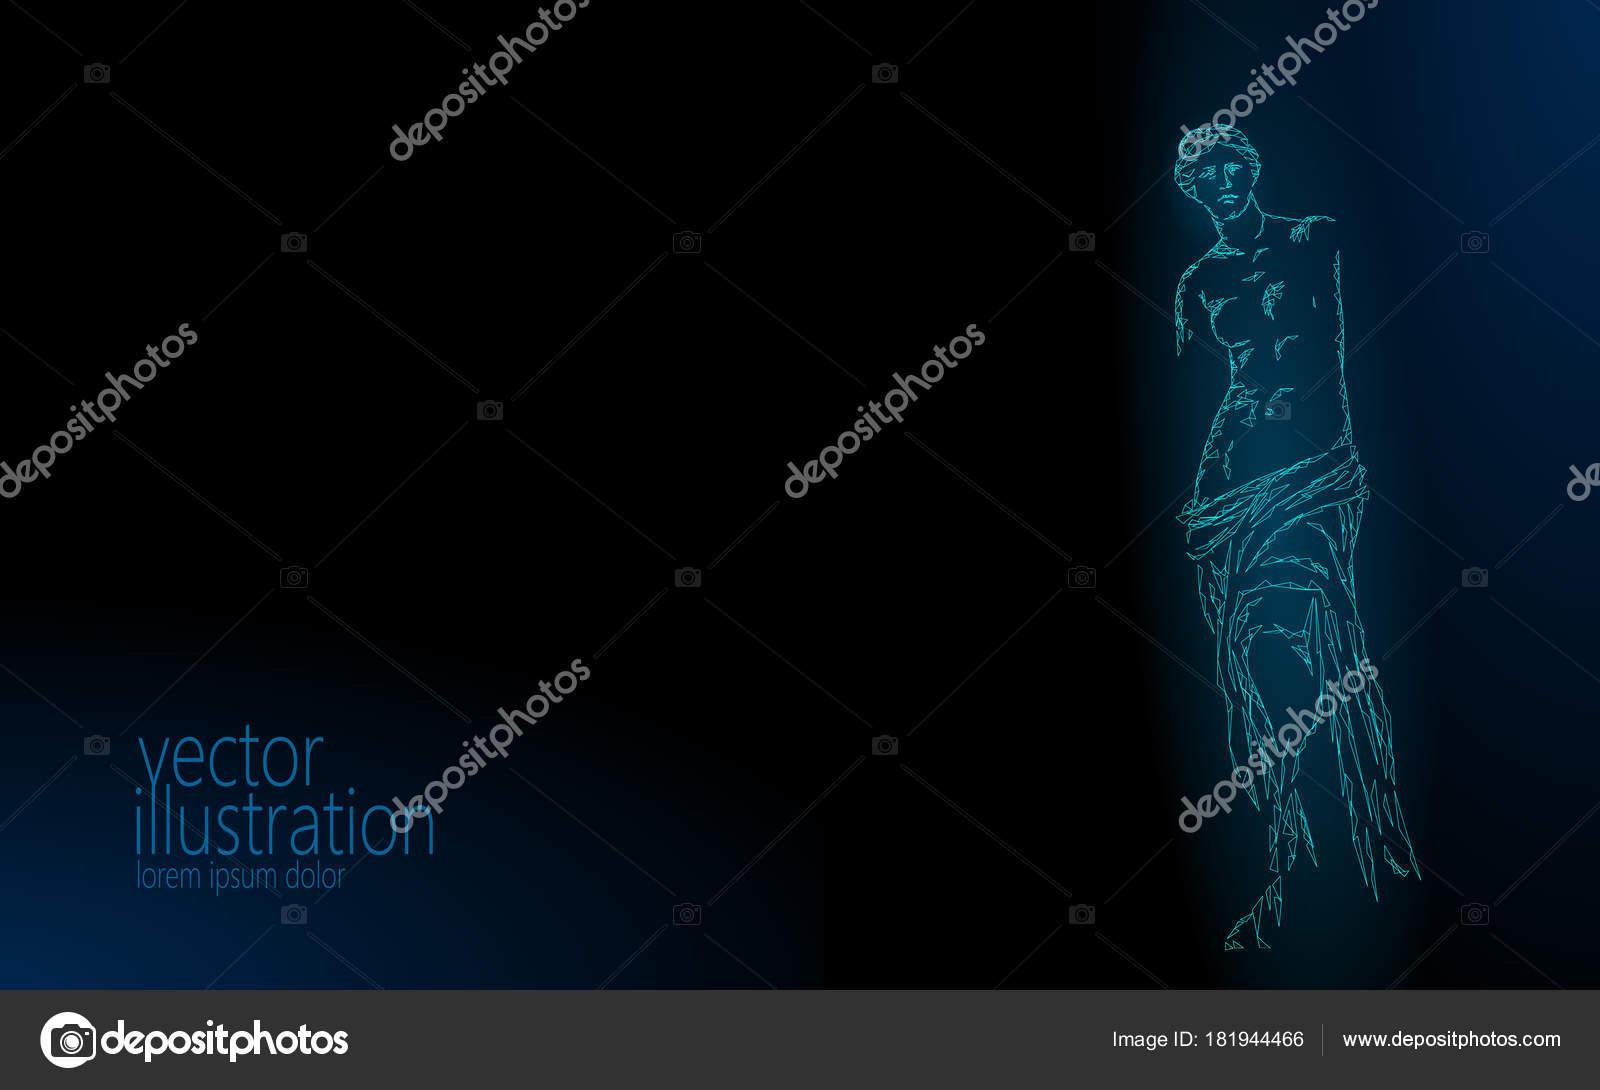 Aphrodite of milos venus de milo ancient greek statue low poly aphrodite of milos venus de milo ancient greek statue low poly modern concept polygonal triangle point line dark blue background museum poster template voltagebd Choice Image